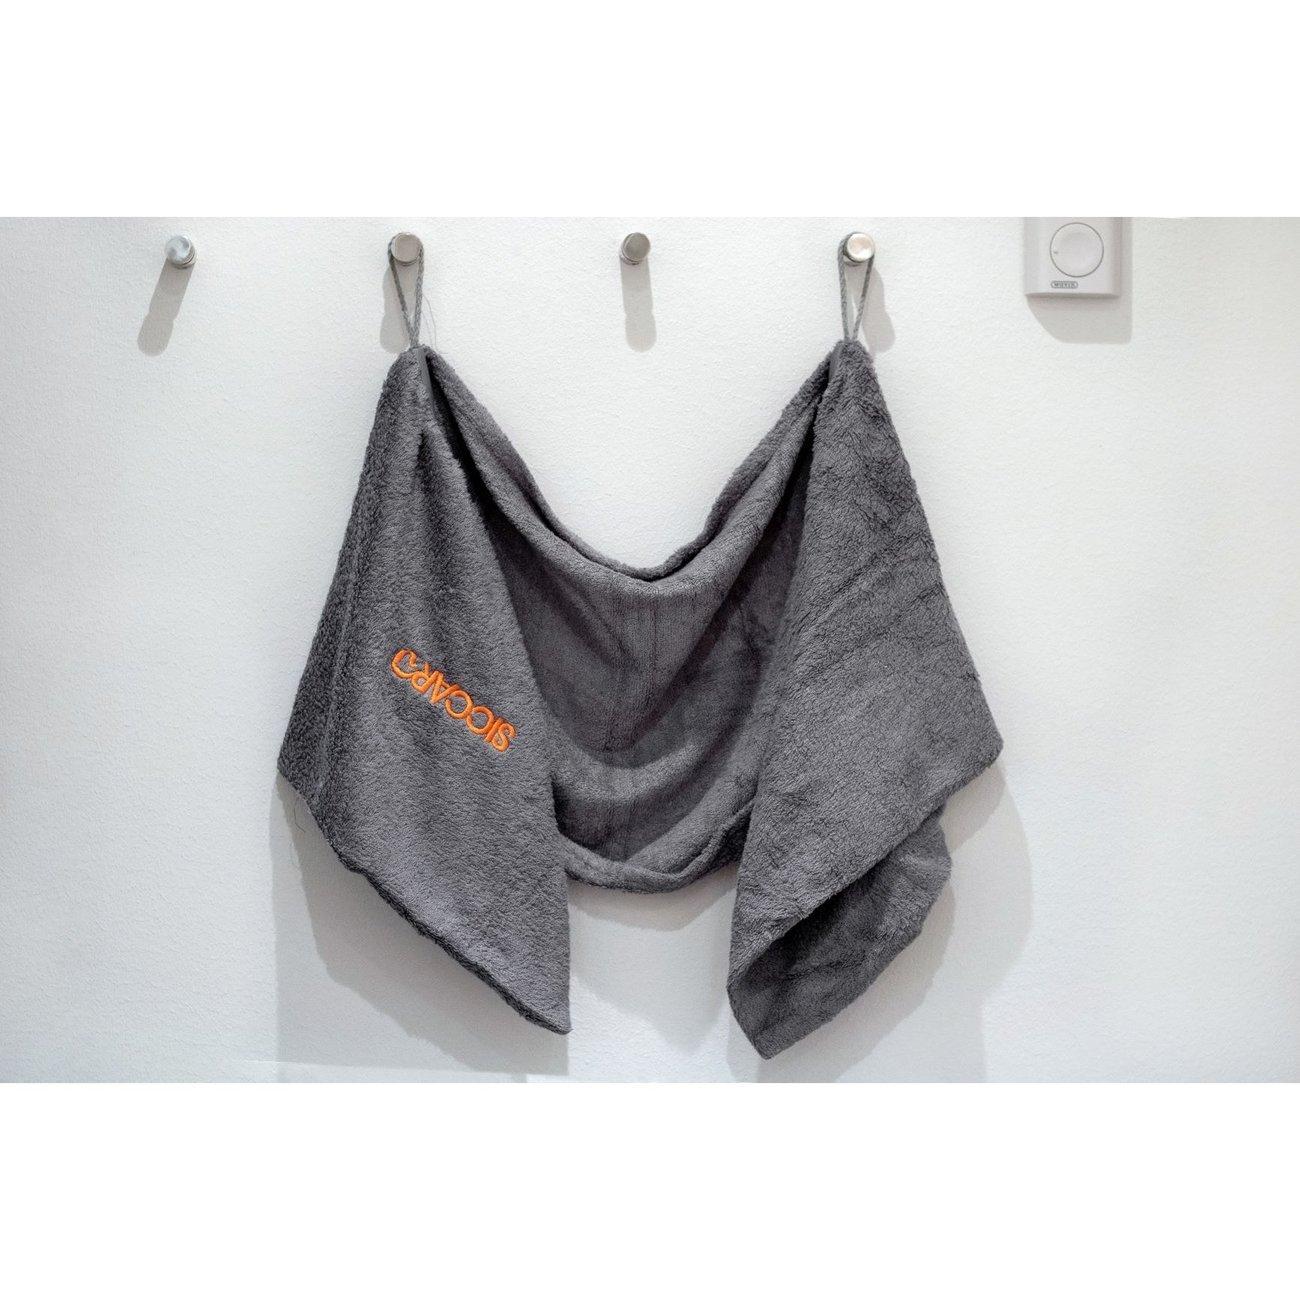 SICCARO Handtuch EasyDry Towel für Hunde, Bild 5